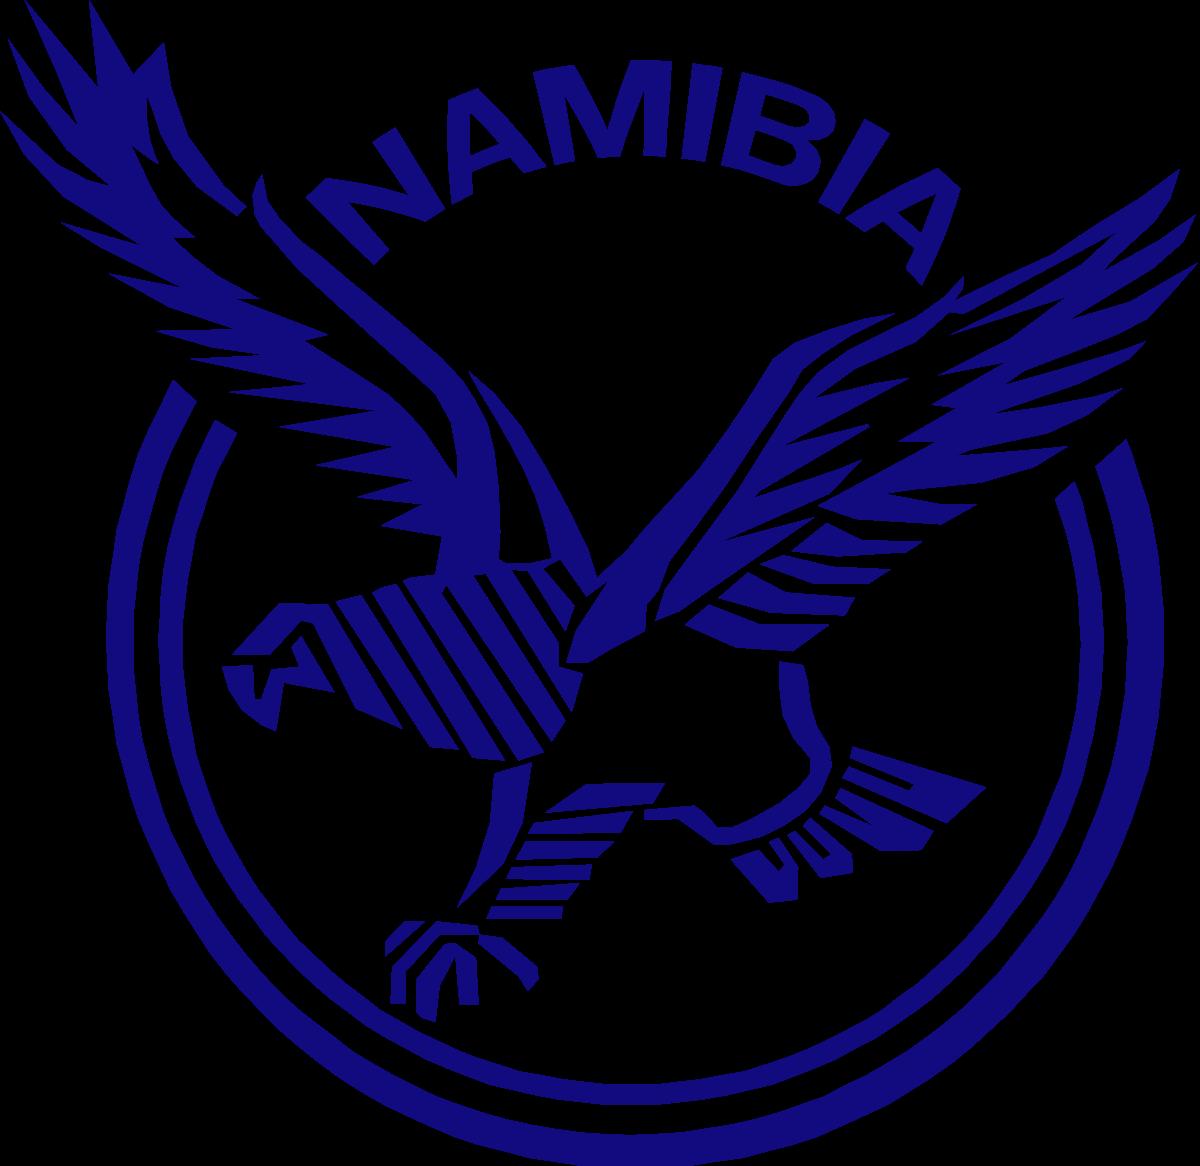 Namibian rugby logo